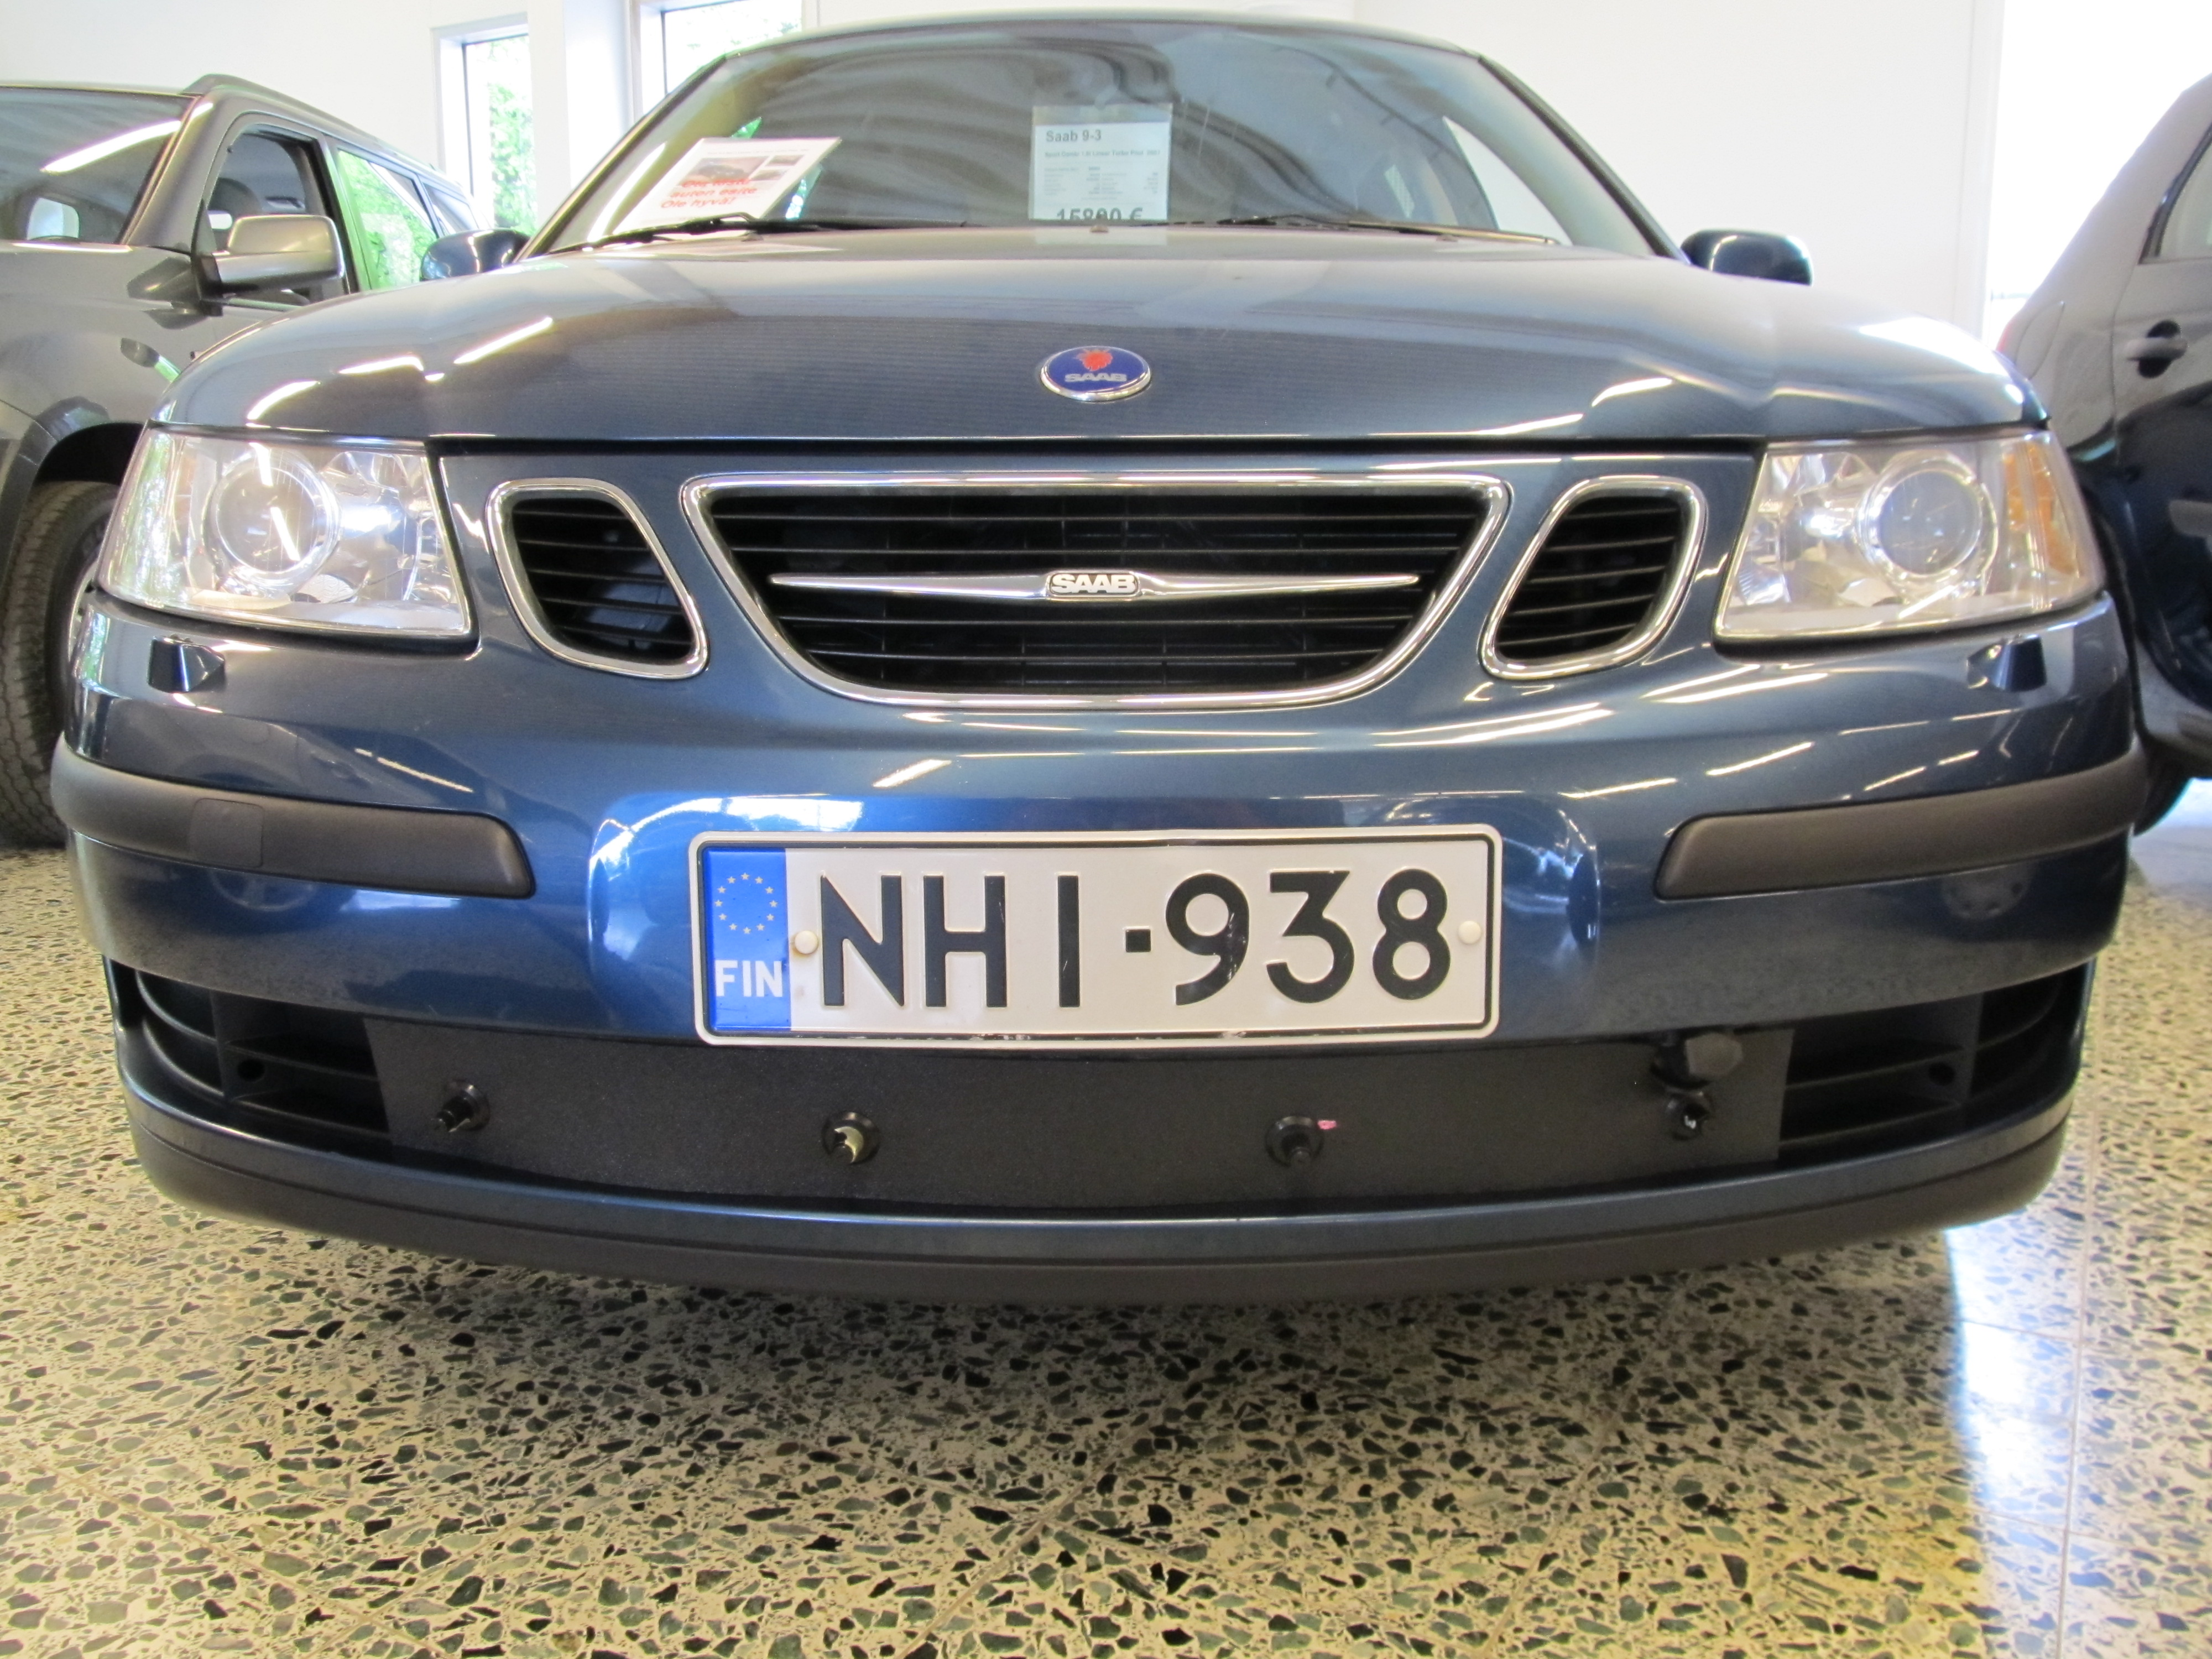 Maskisuoja Saab 9-3 2003-2007